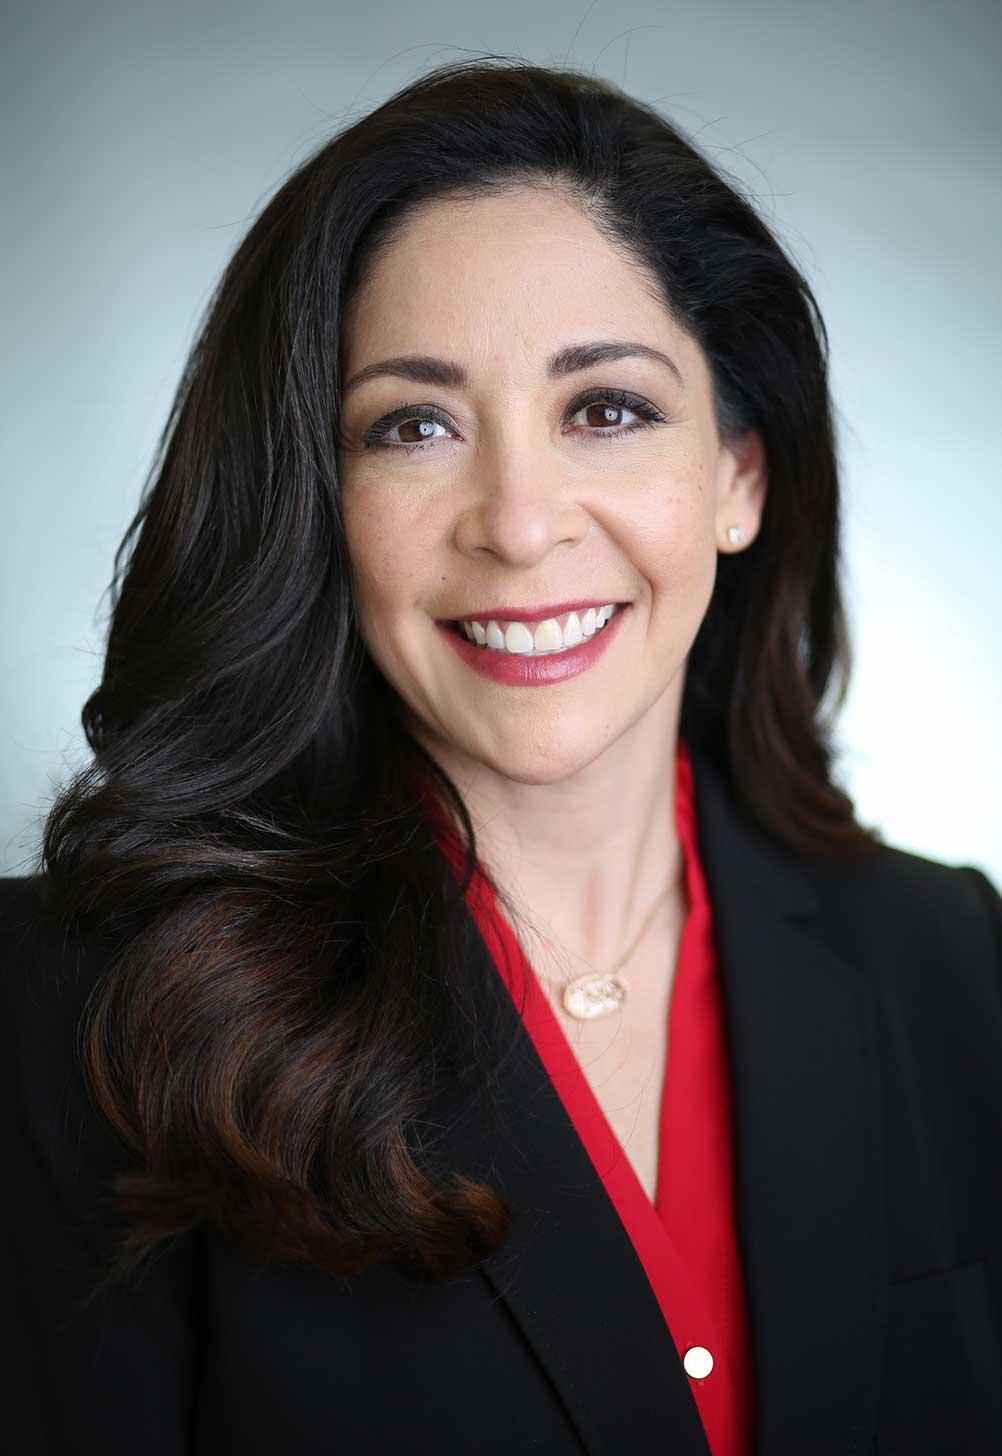 Christina Guggisberg